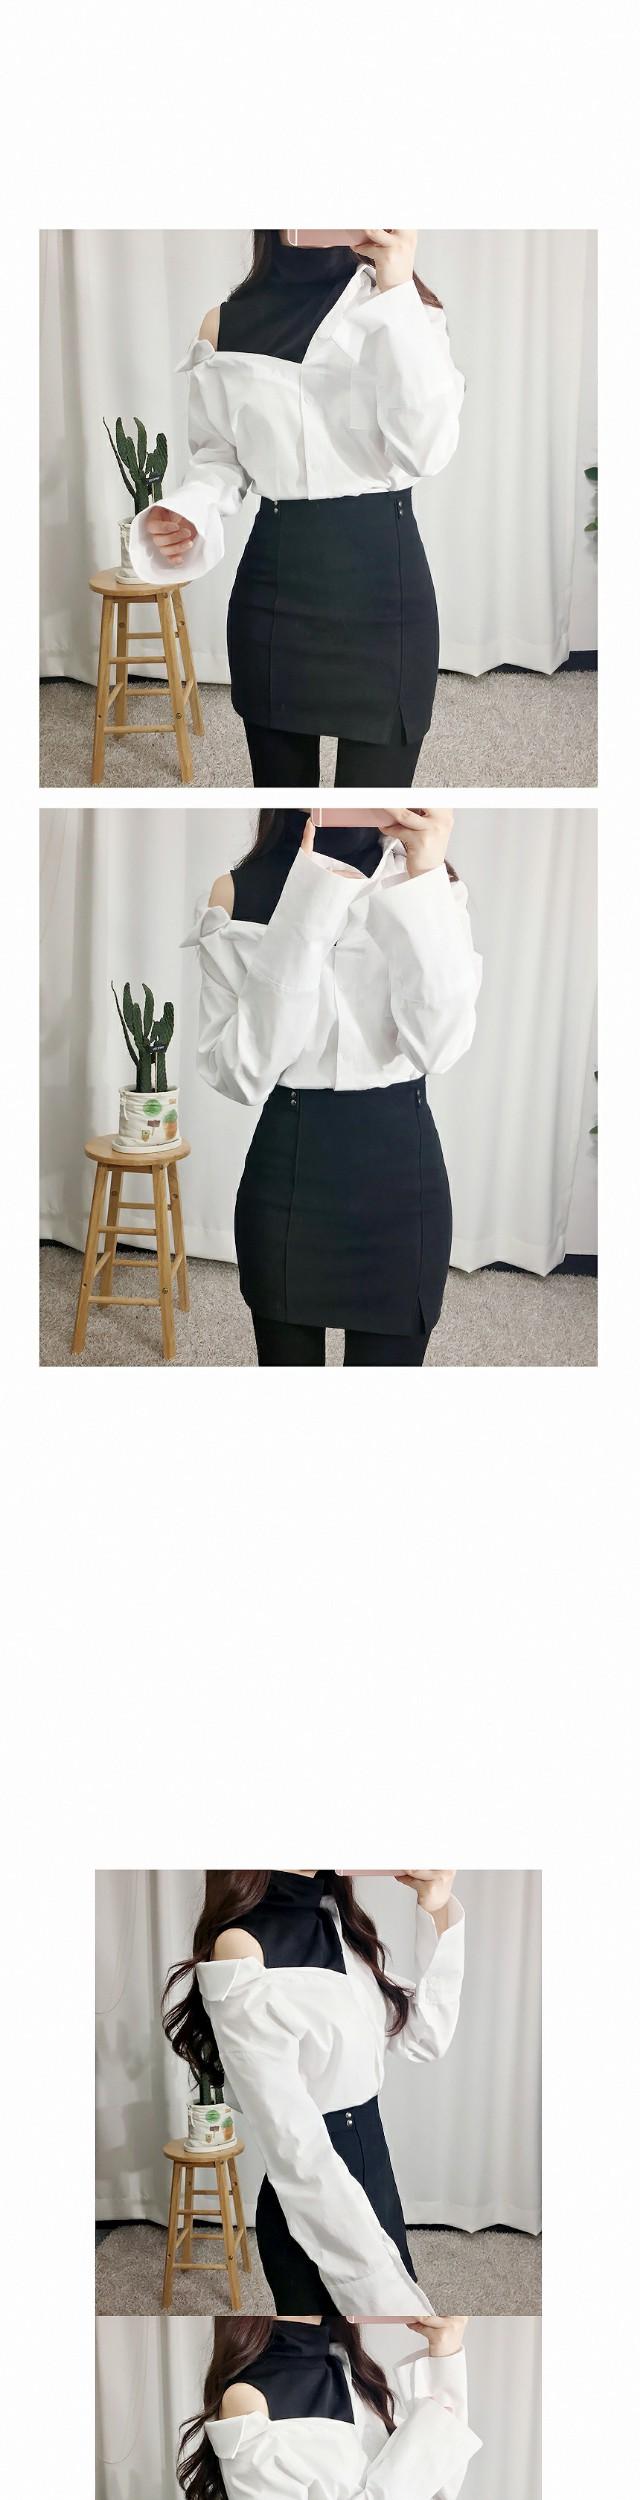 Layered turtleneck shirt